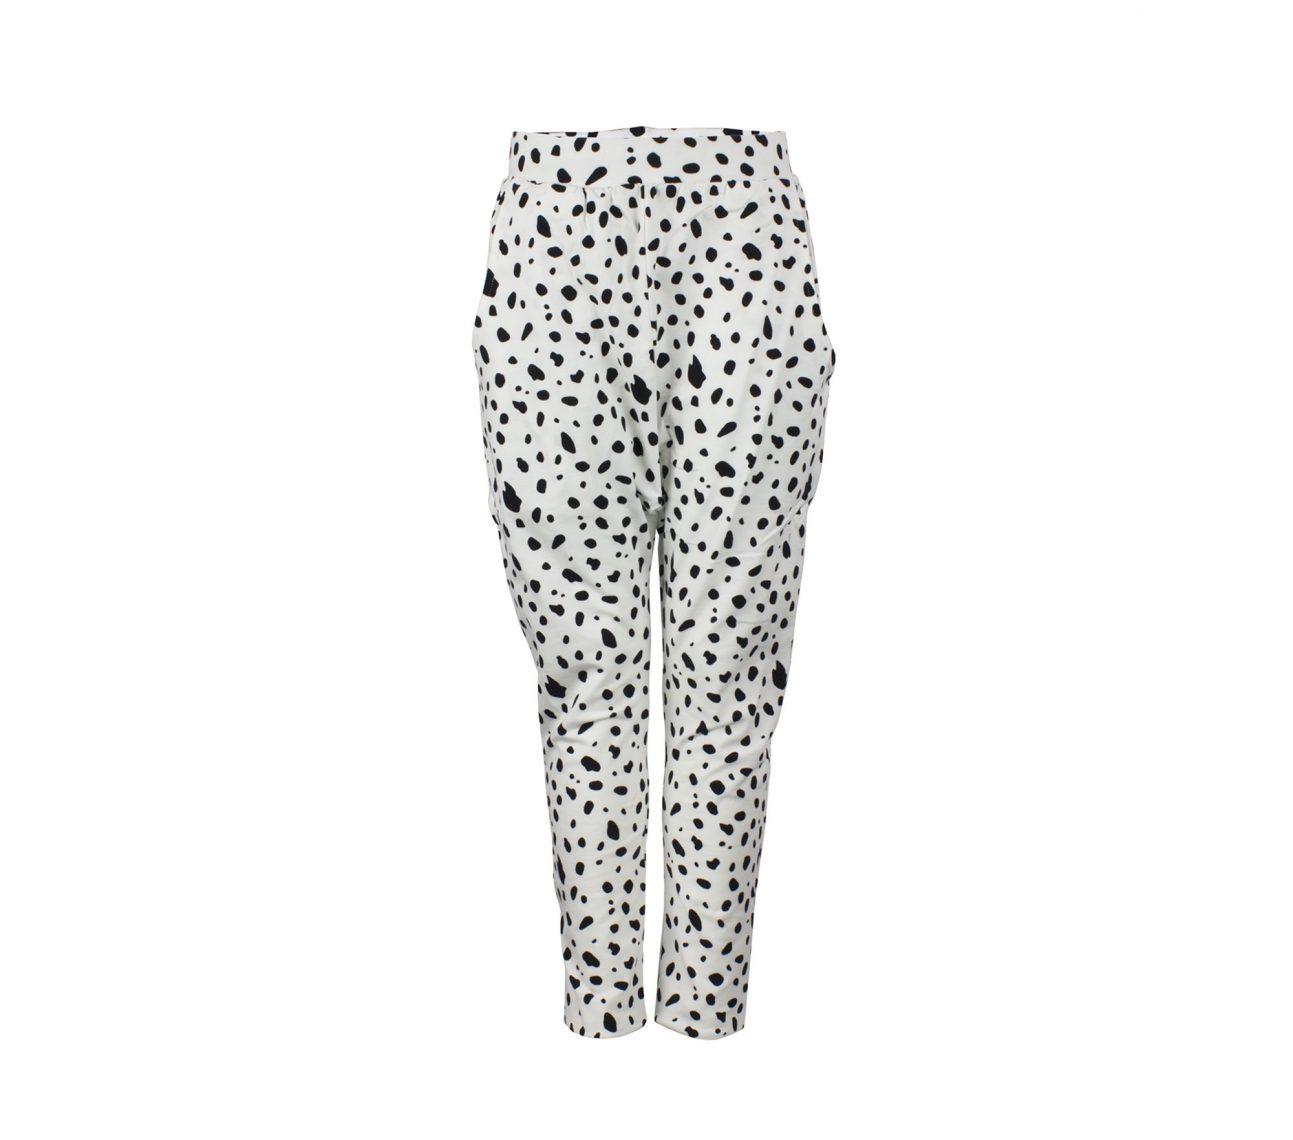 Haremsbyxa barn svart/vit dalmatin – Memphis